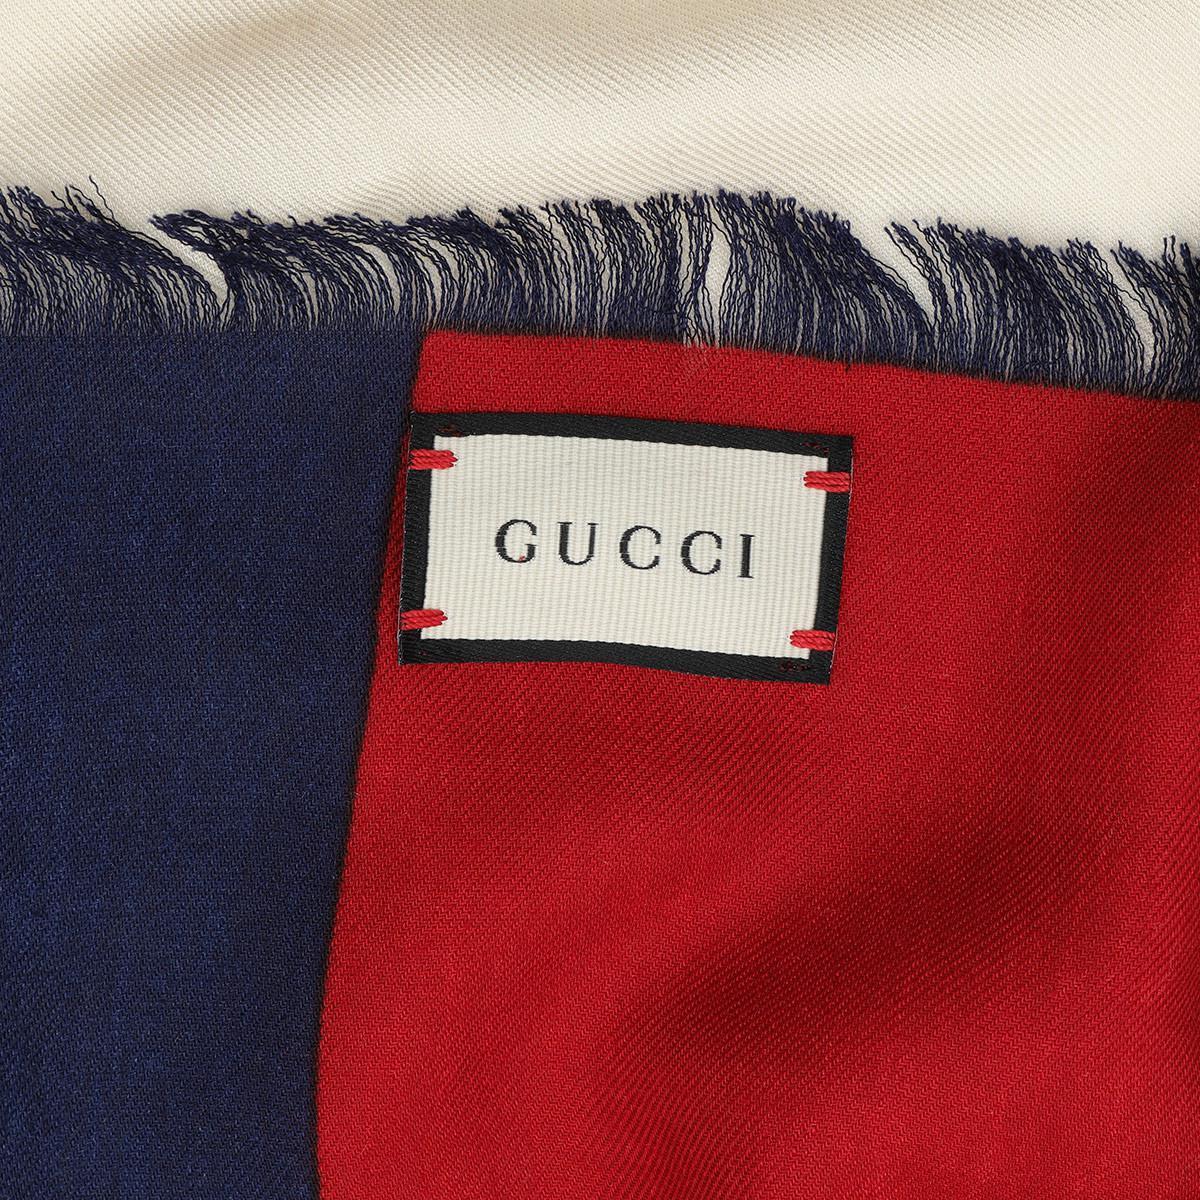 692b45c549e Gucci - White Guccy Web Modal Silk Scarf Ivory blue - Lyst. View fullscreen